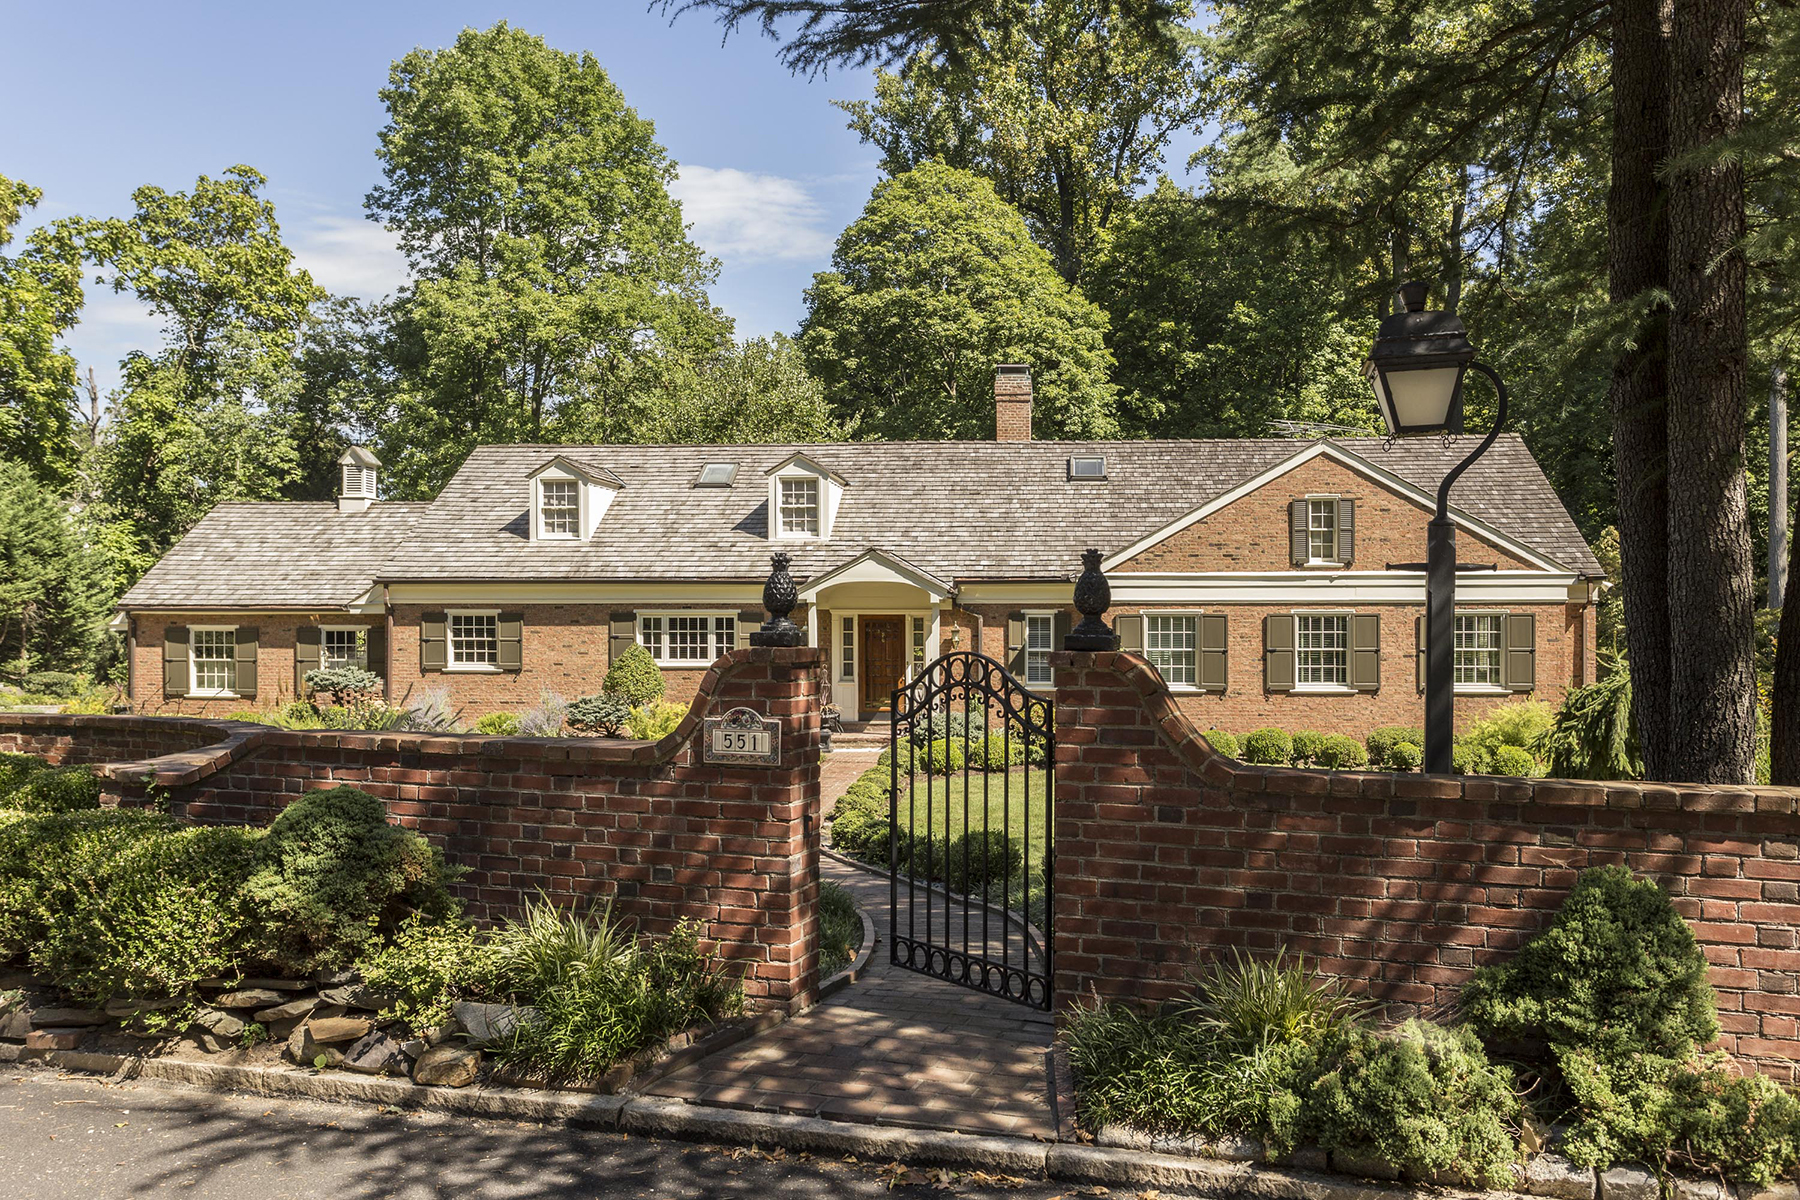 Частный односемейный дом для того Продажа на Haverford, PA 551 Ferndale Ln. Haverford, 19041 Соединенные Штаты